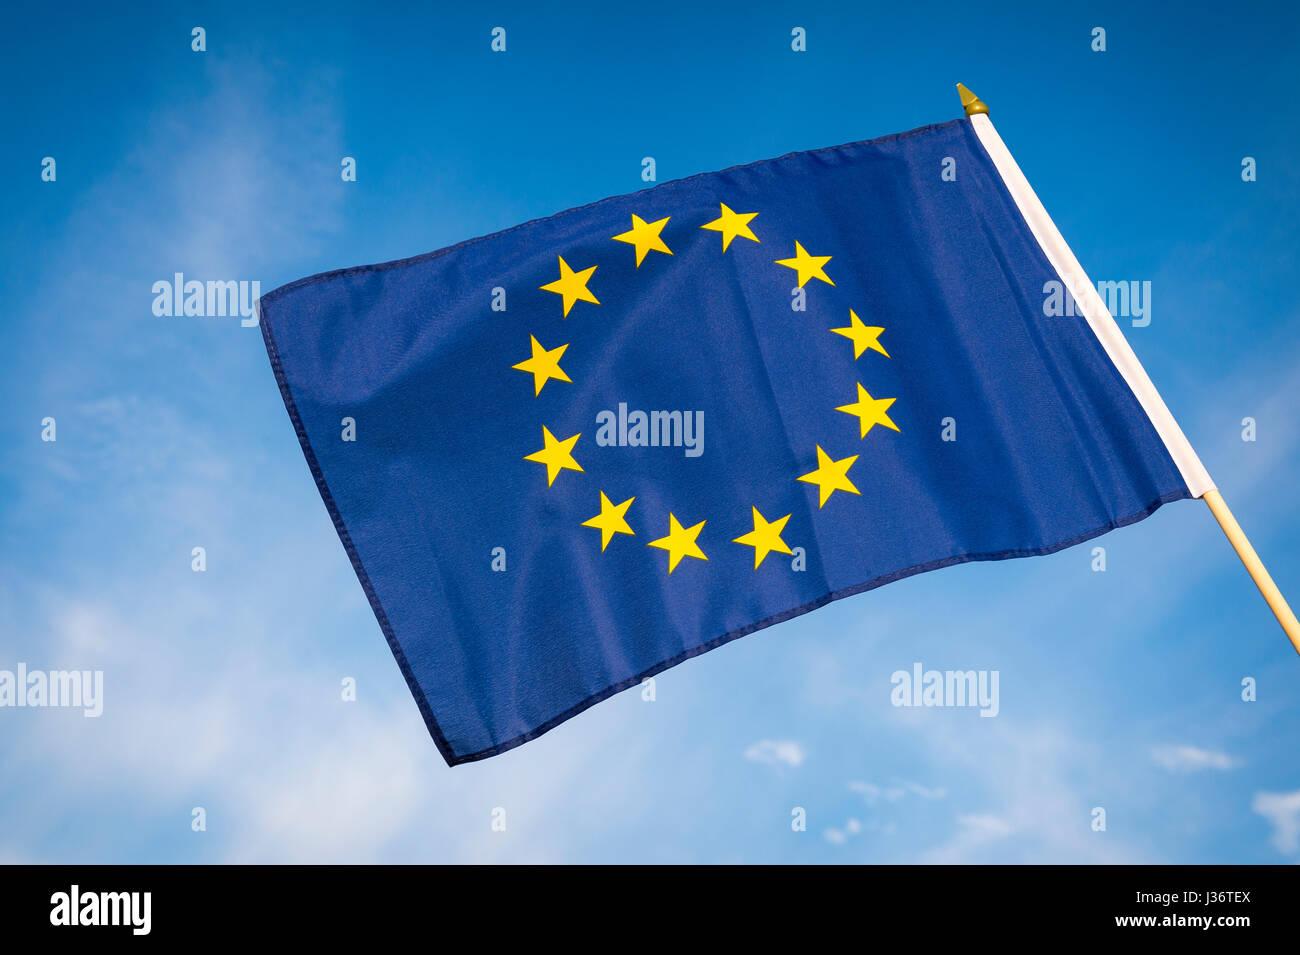 EU Europäische Union Flagge im Freien bei strahlend blauem Himmel Stockbild